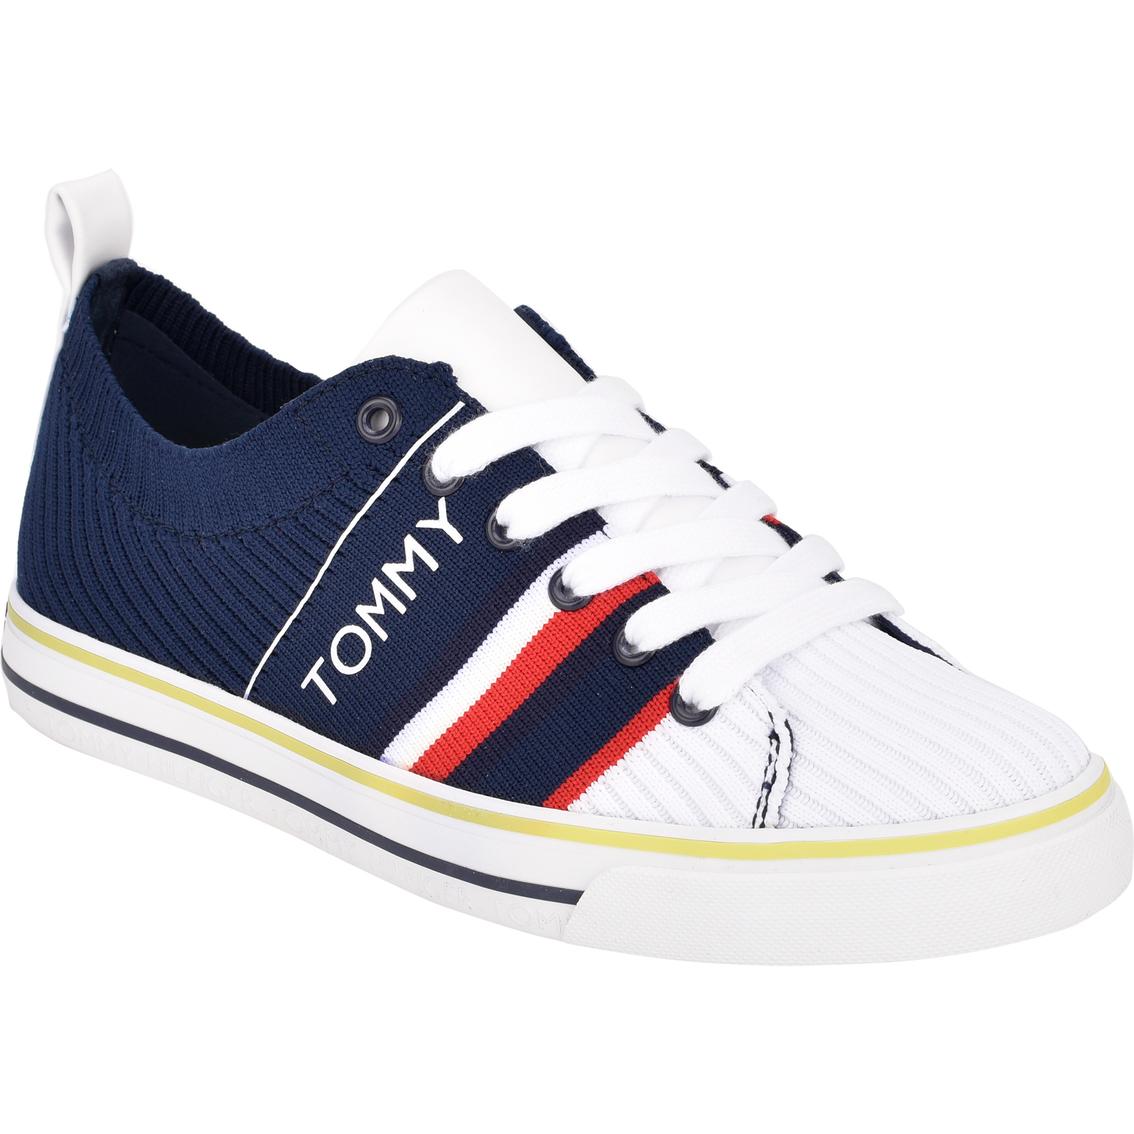 tommy hilfiger gym shoes